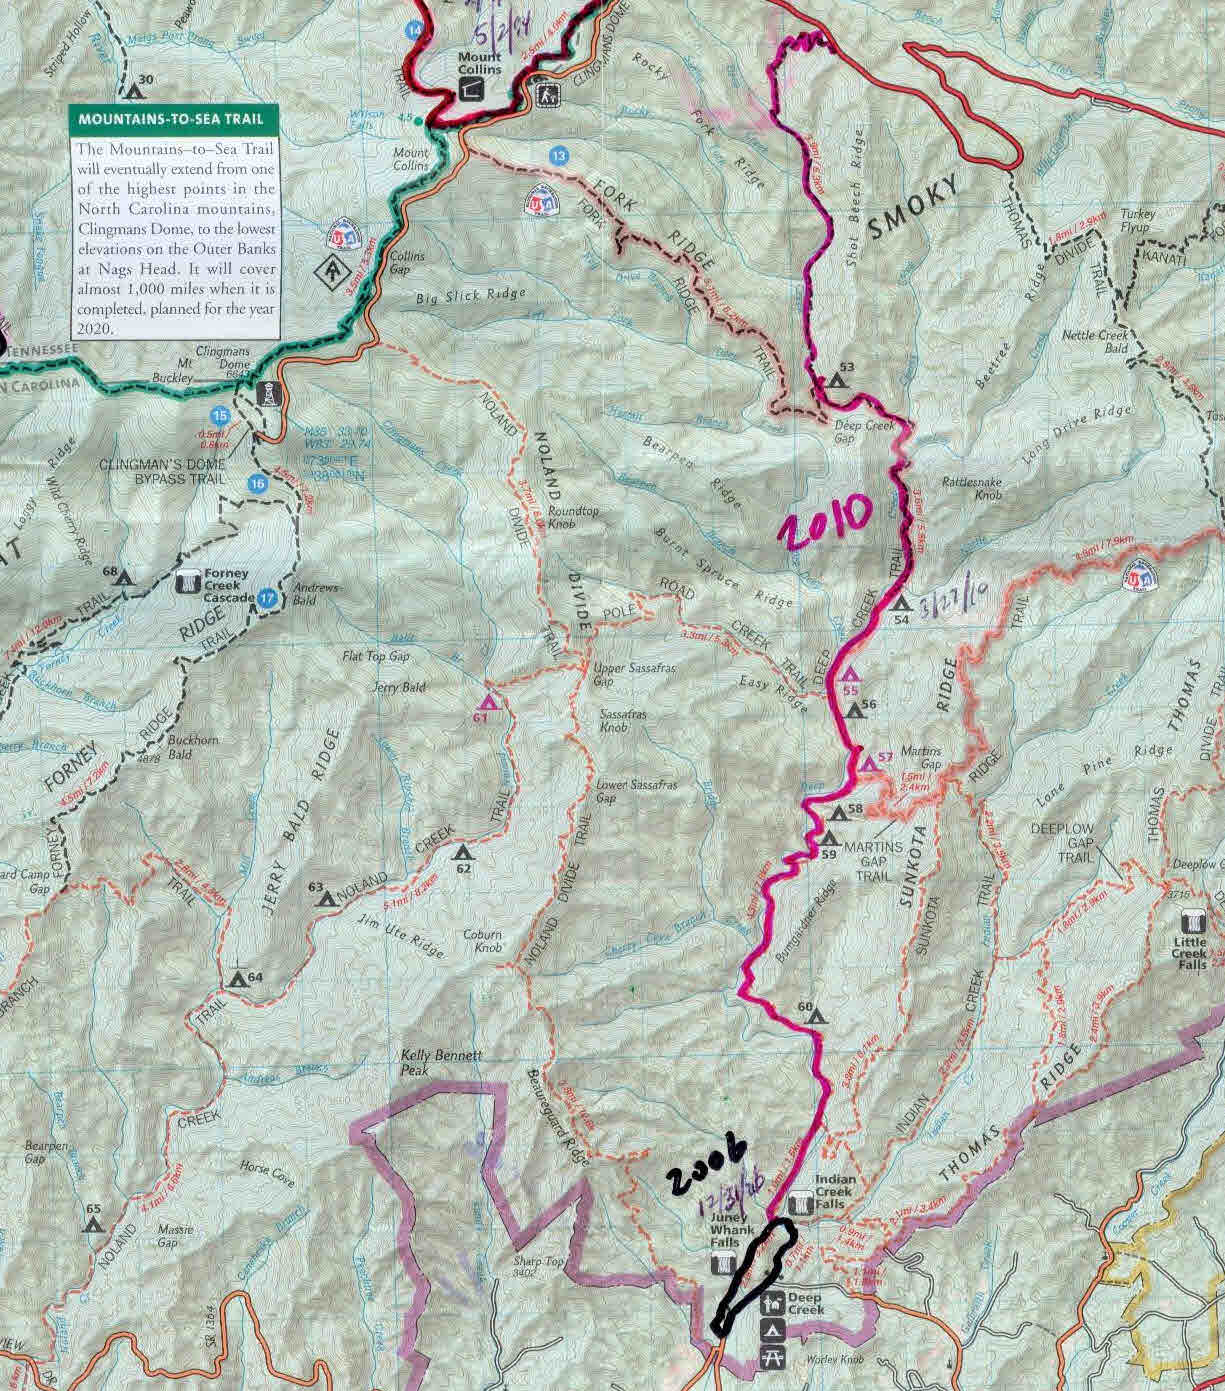 GREAT SMOKY MOUNTAINS - DEEP CREEK | n2backng.com on